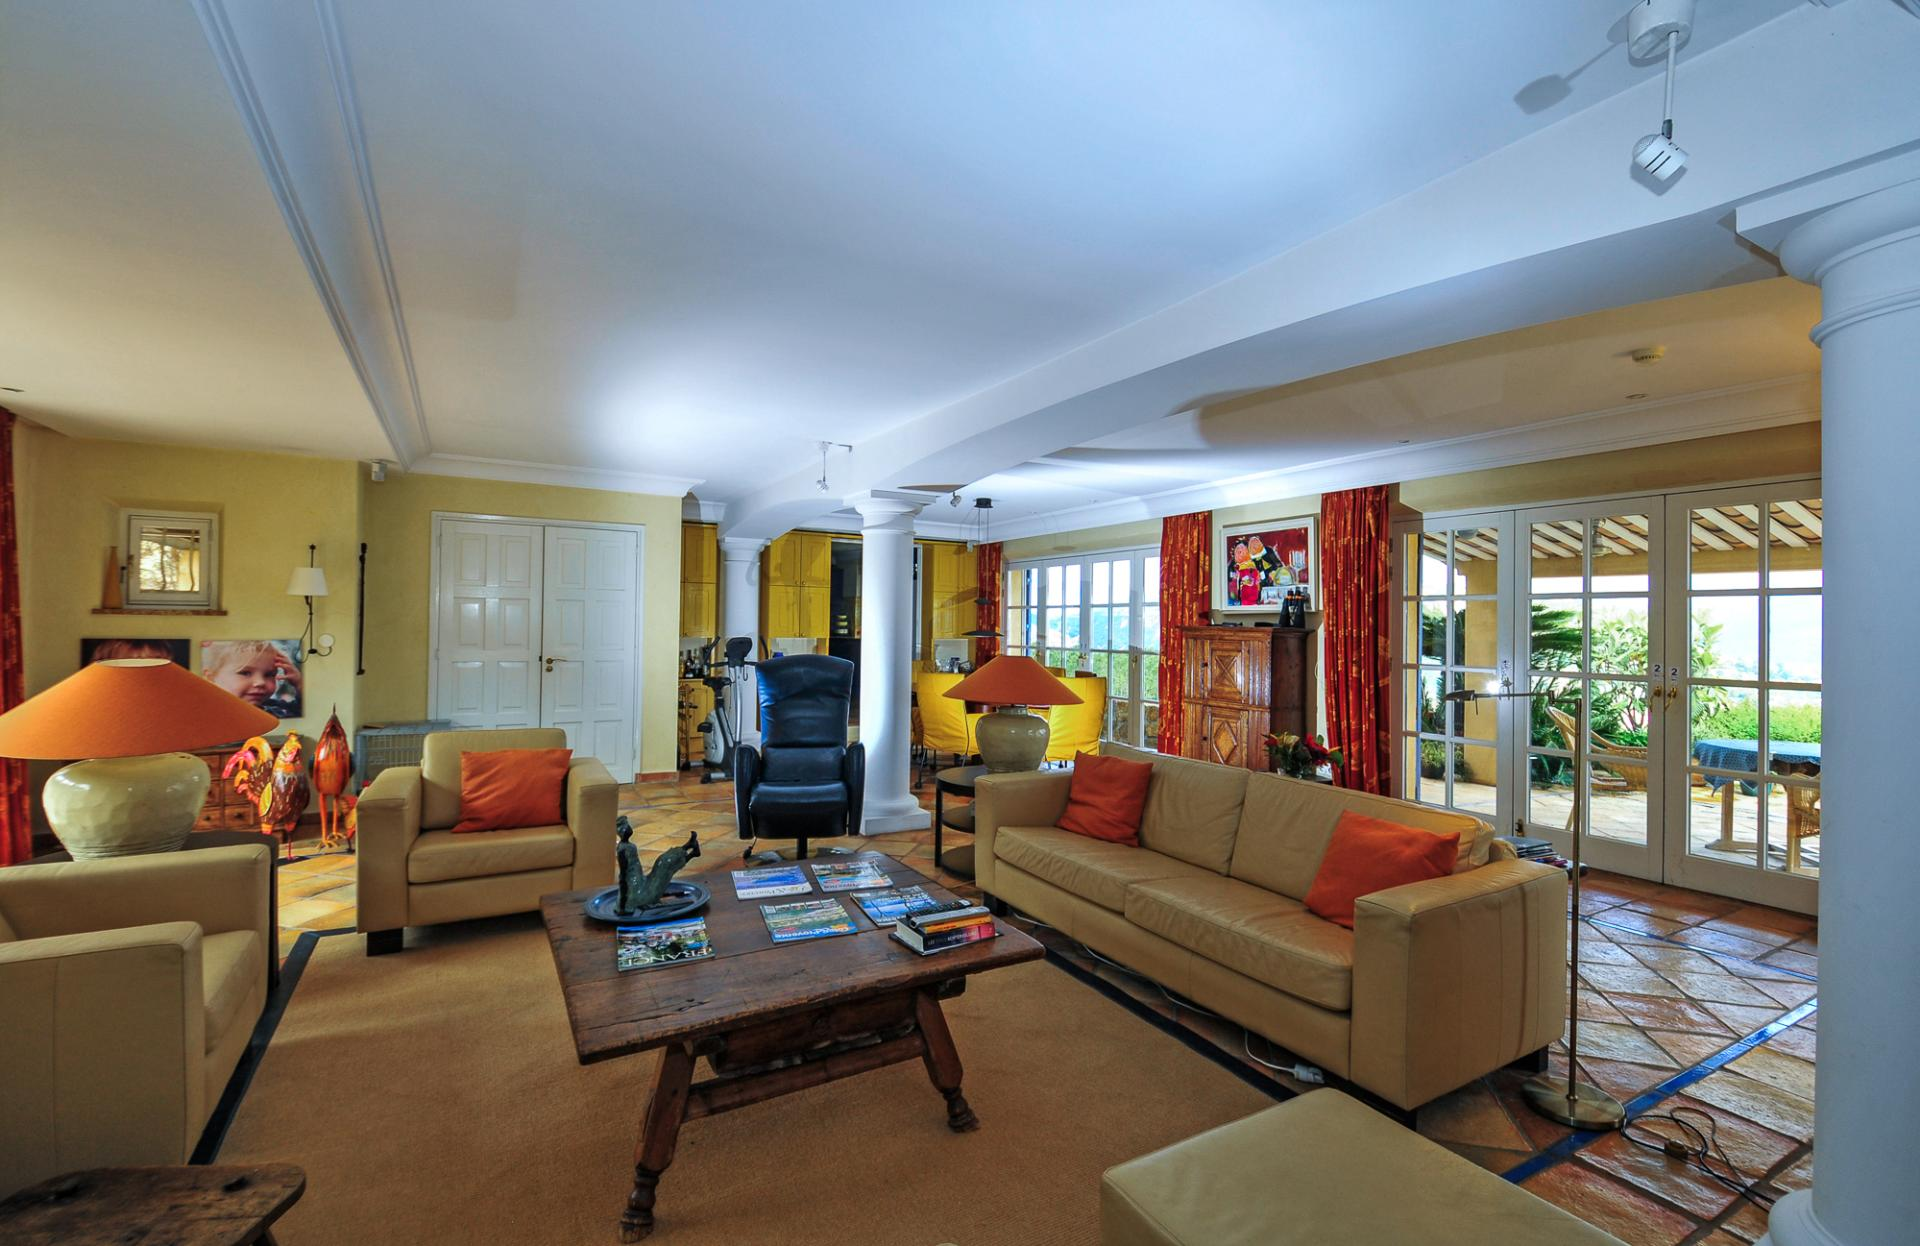 Living Room, L'Hippocampe, Theoule-sur-mer, Cote d'Azur.